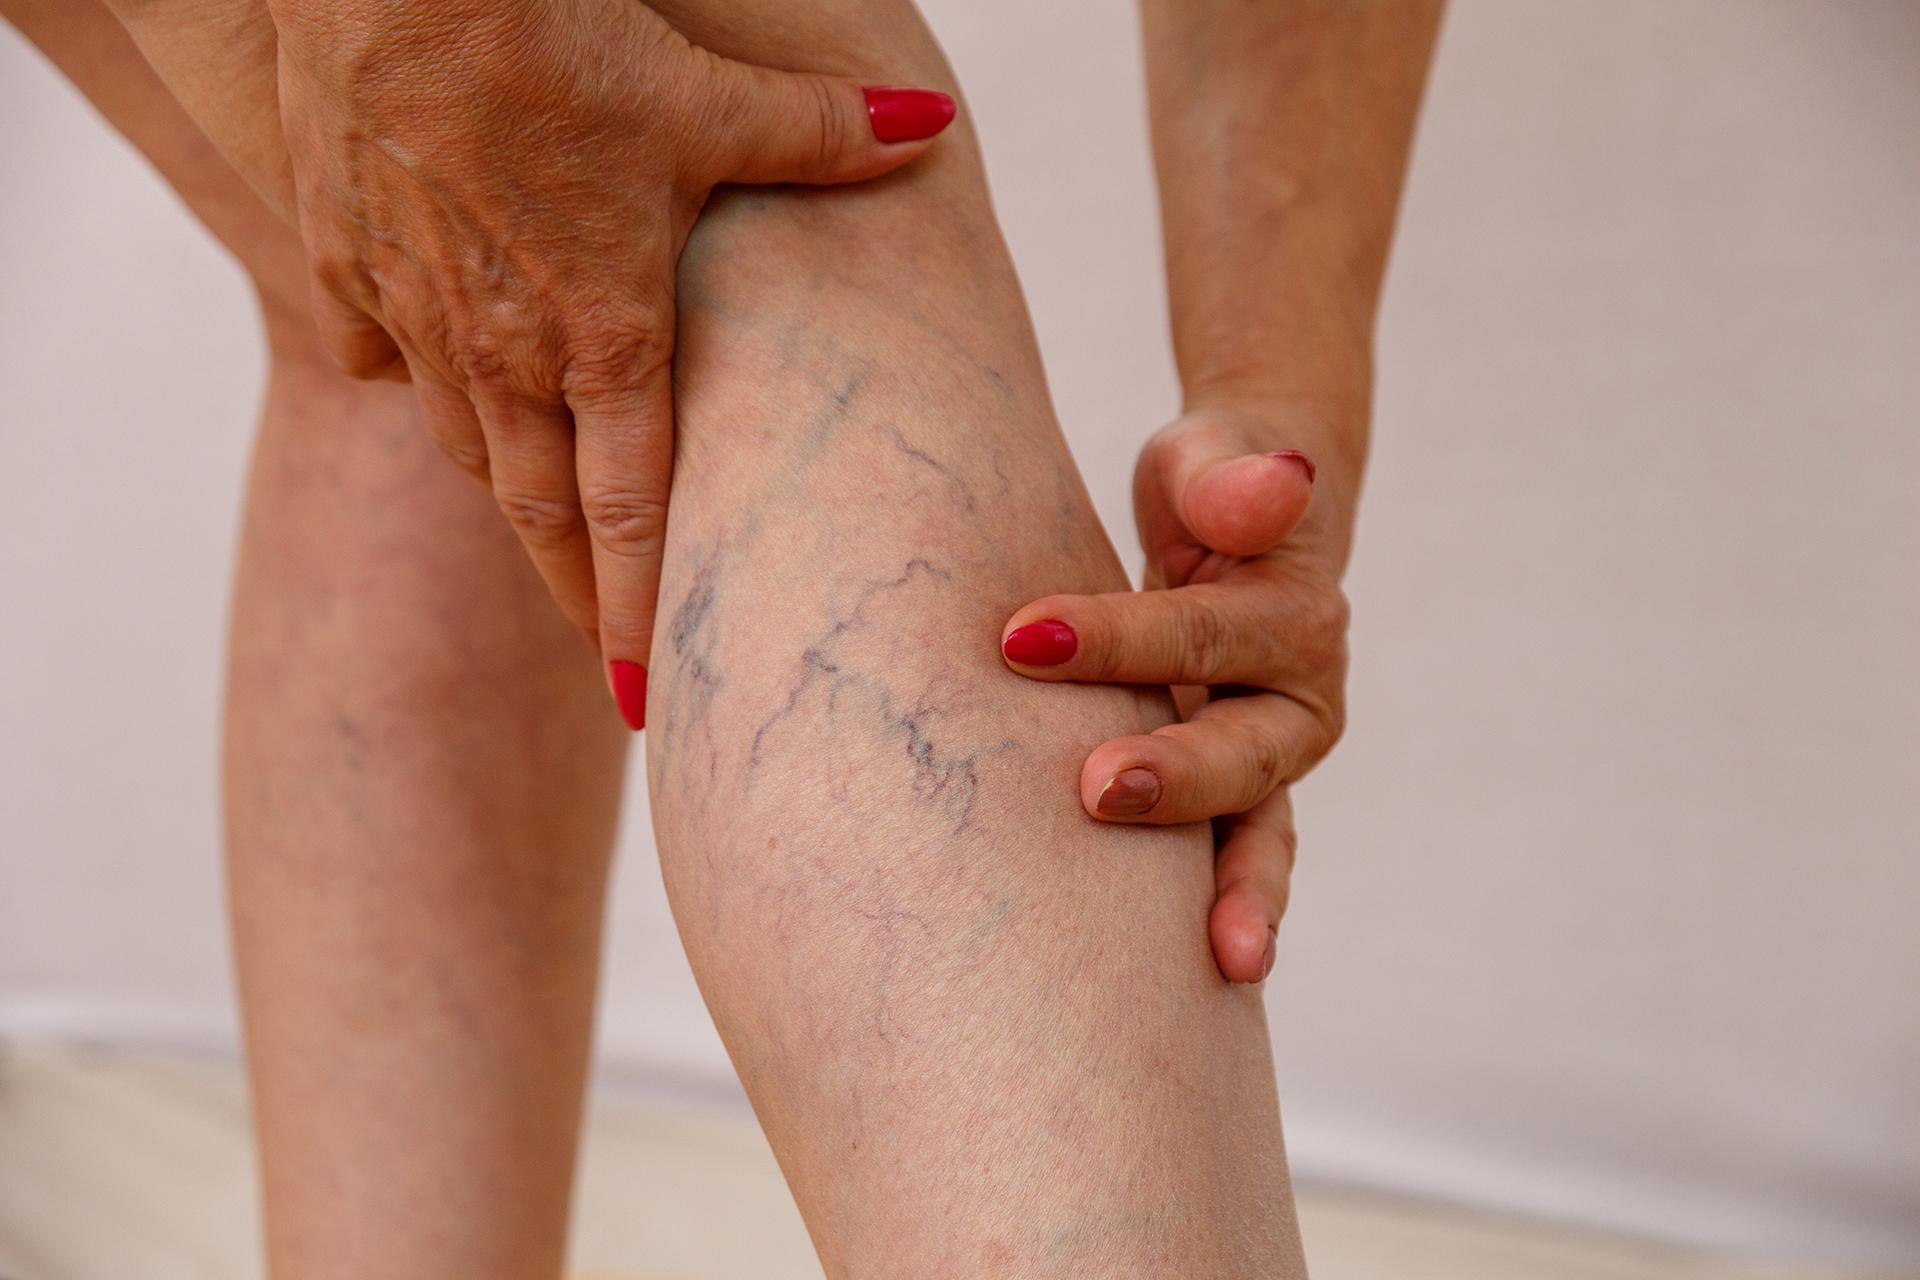 vascular-issues-requiring-leg-pain-doctor-Park-La-Brea